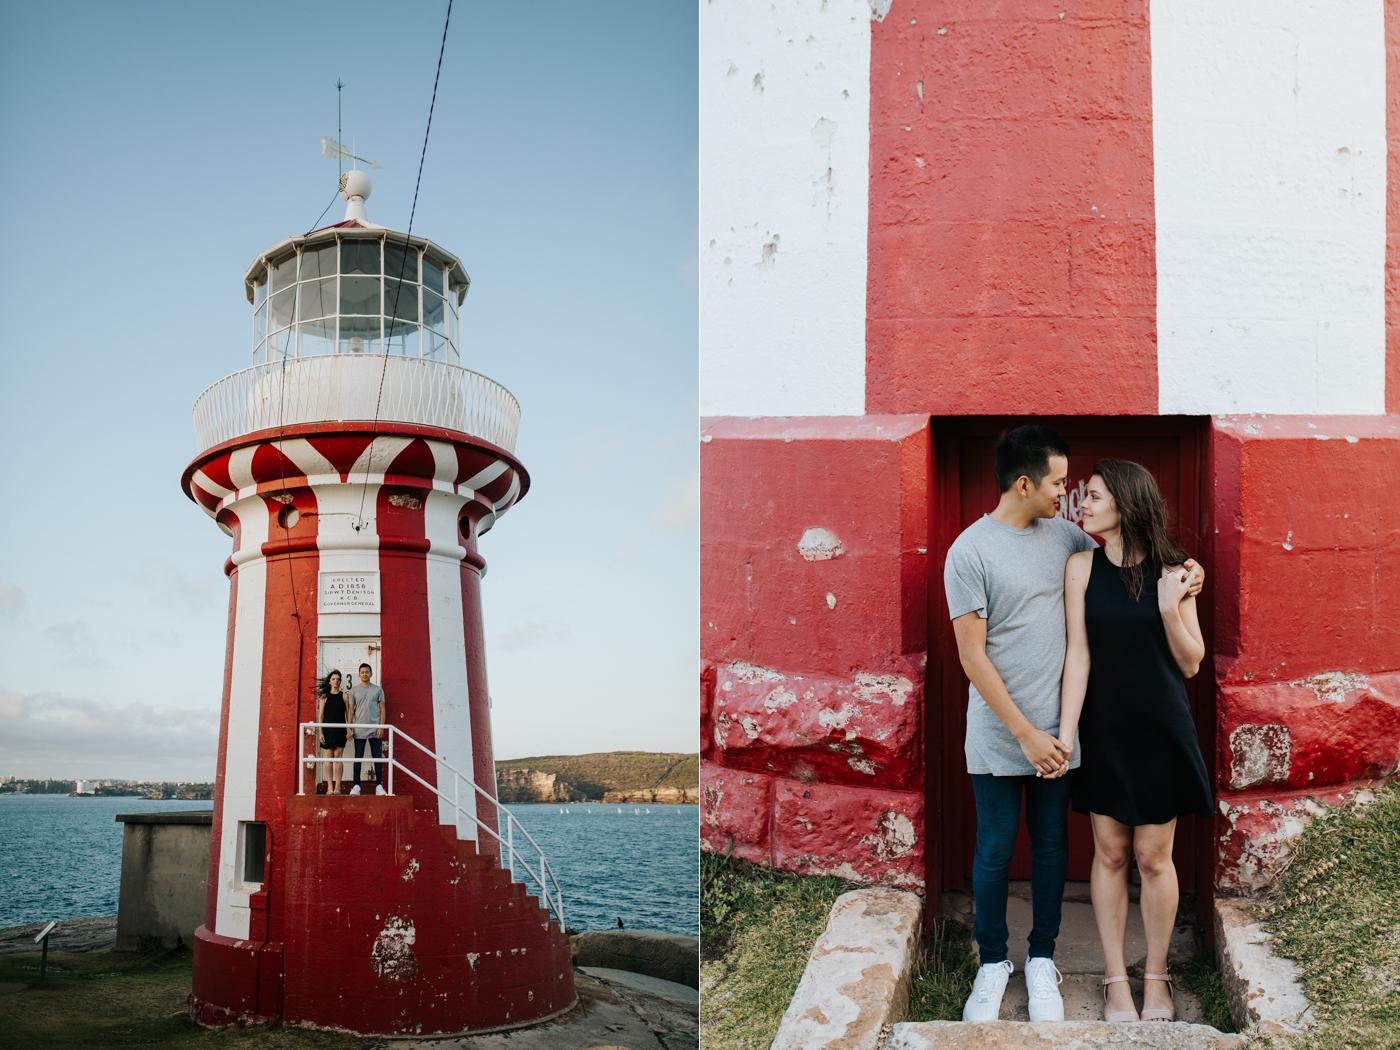 James & Caitie Engagement - Watsons Bay - Samantha Heather Photography-54.jpg